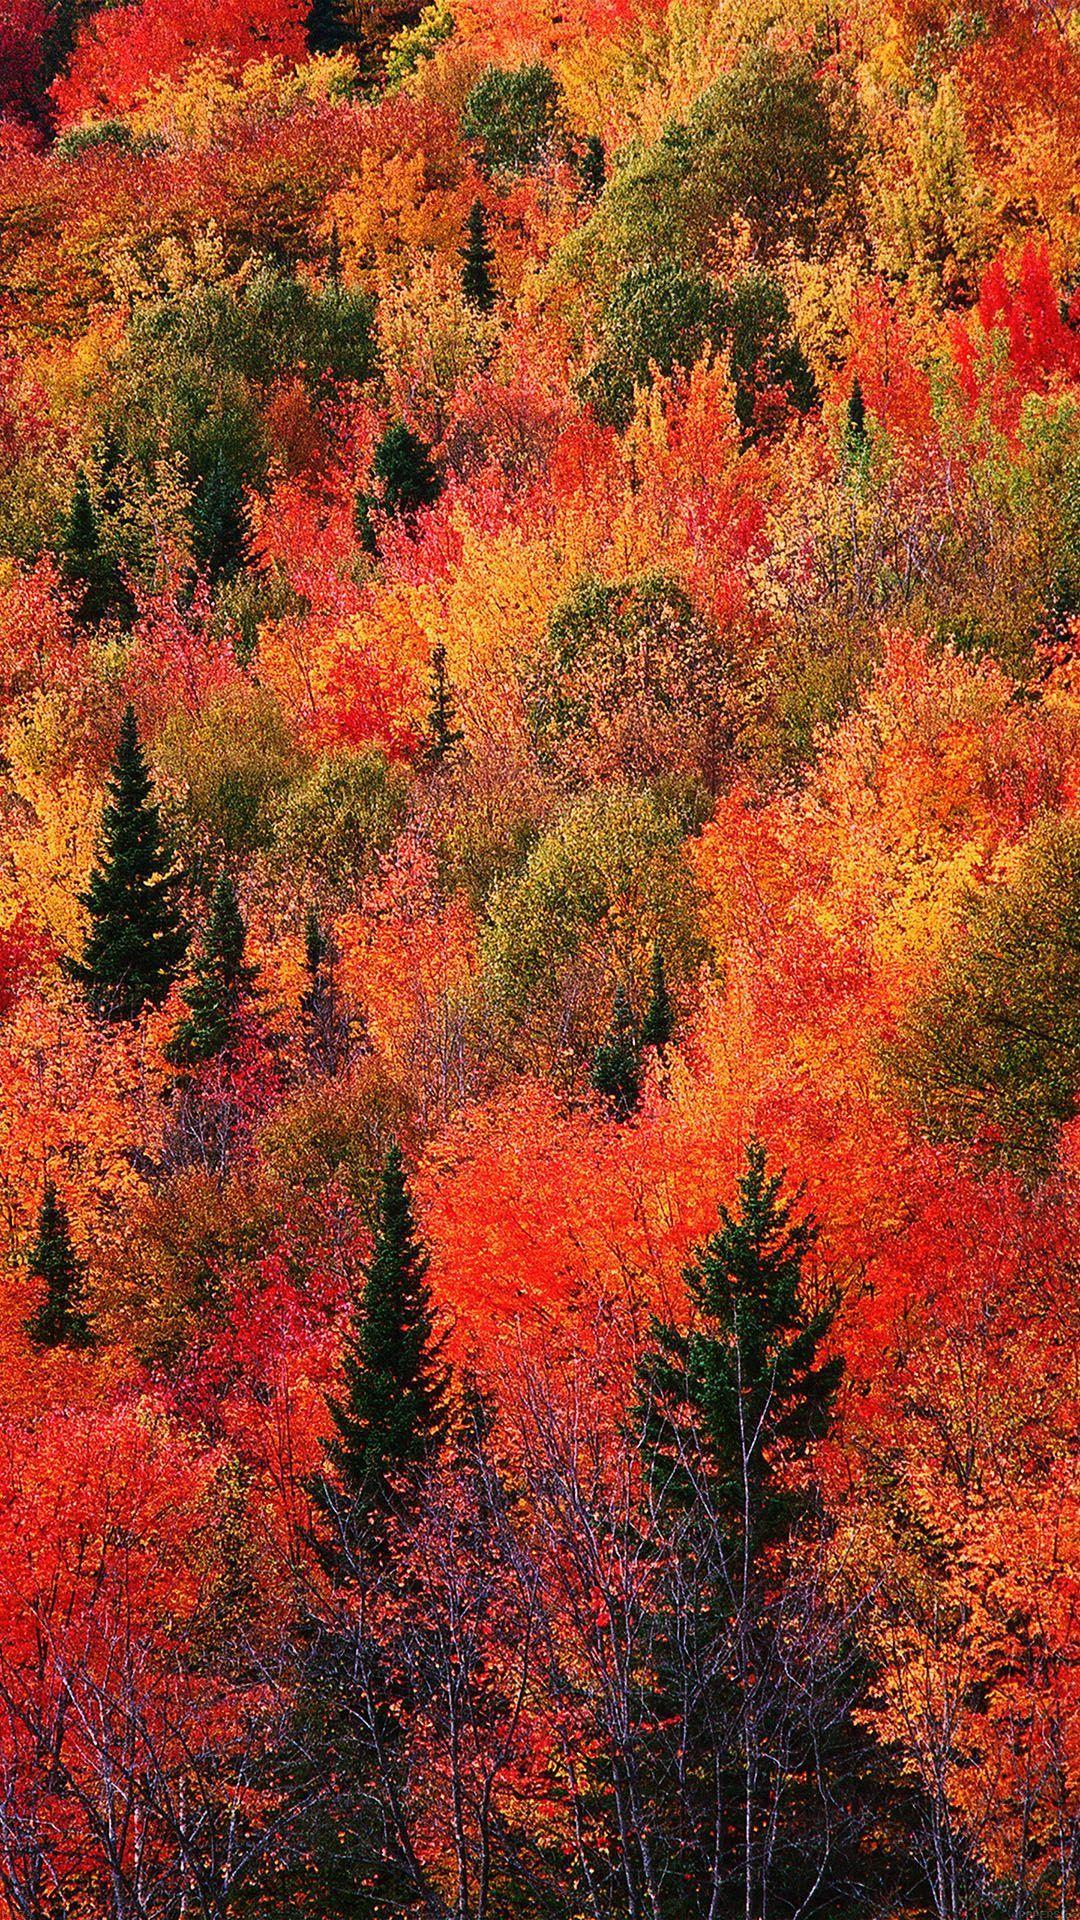 foto de Autumn iPhone 6 Plus Wallpapers - Top Free Autumn iPhone 6 Plus ...